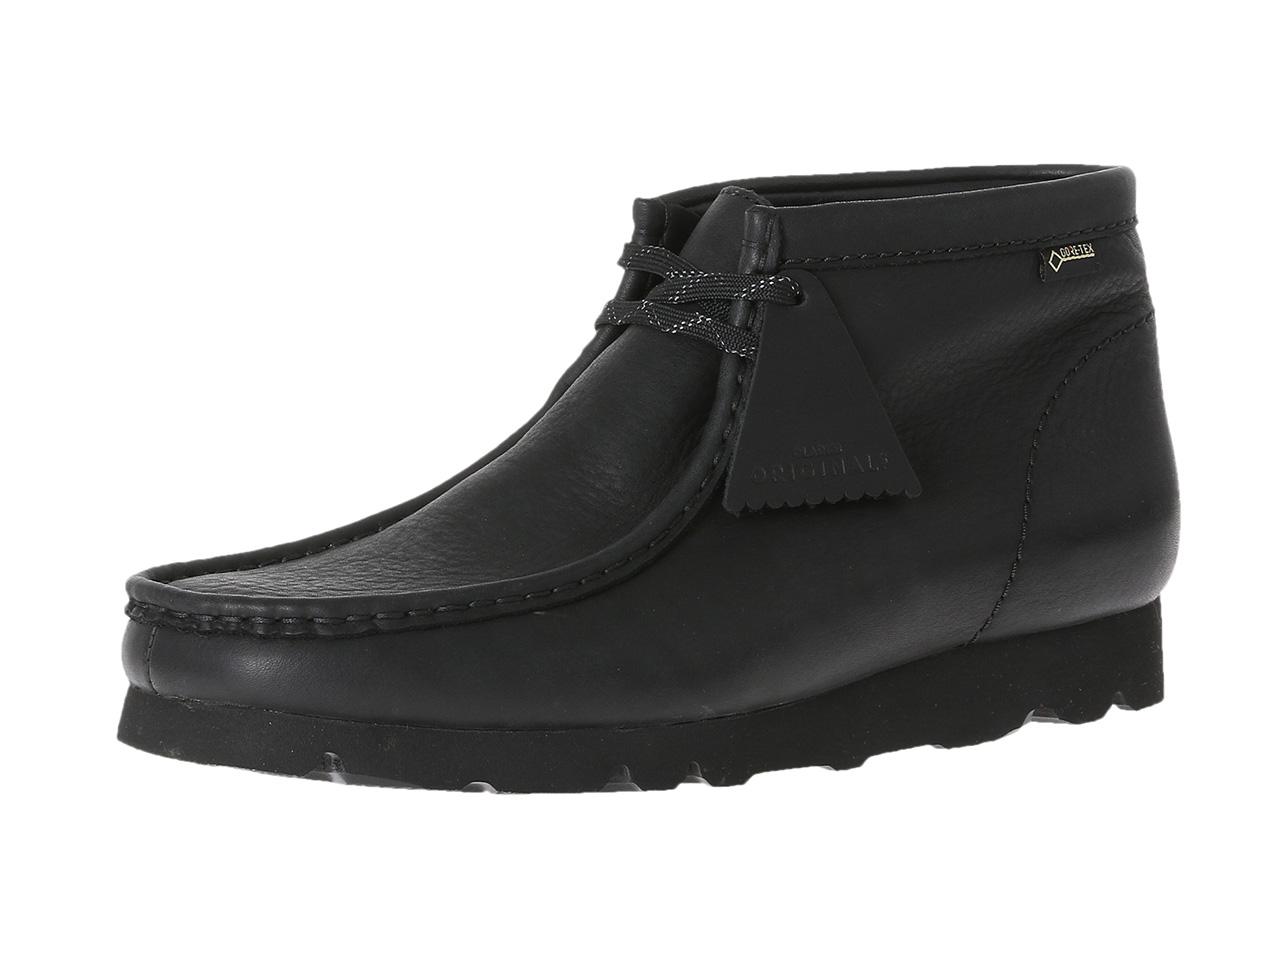 CLARKS WallabeeBT4 GTX(26146260)【クラークス】【シューズ】【ブーツ】【靴】【フットウェア】【ゴアテックス】